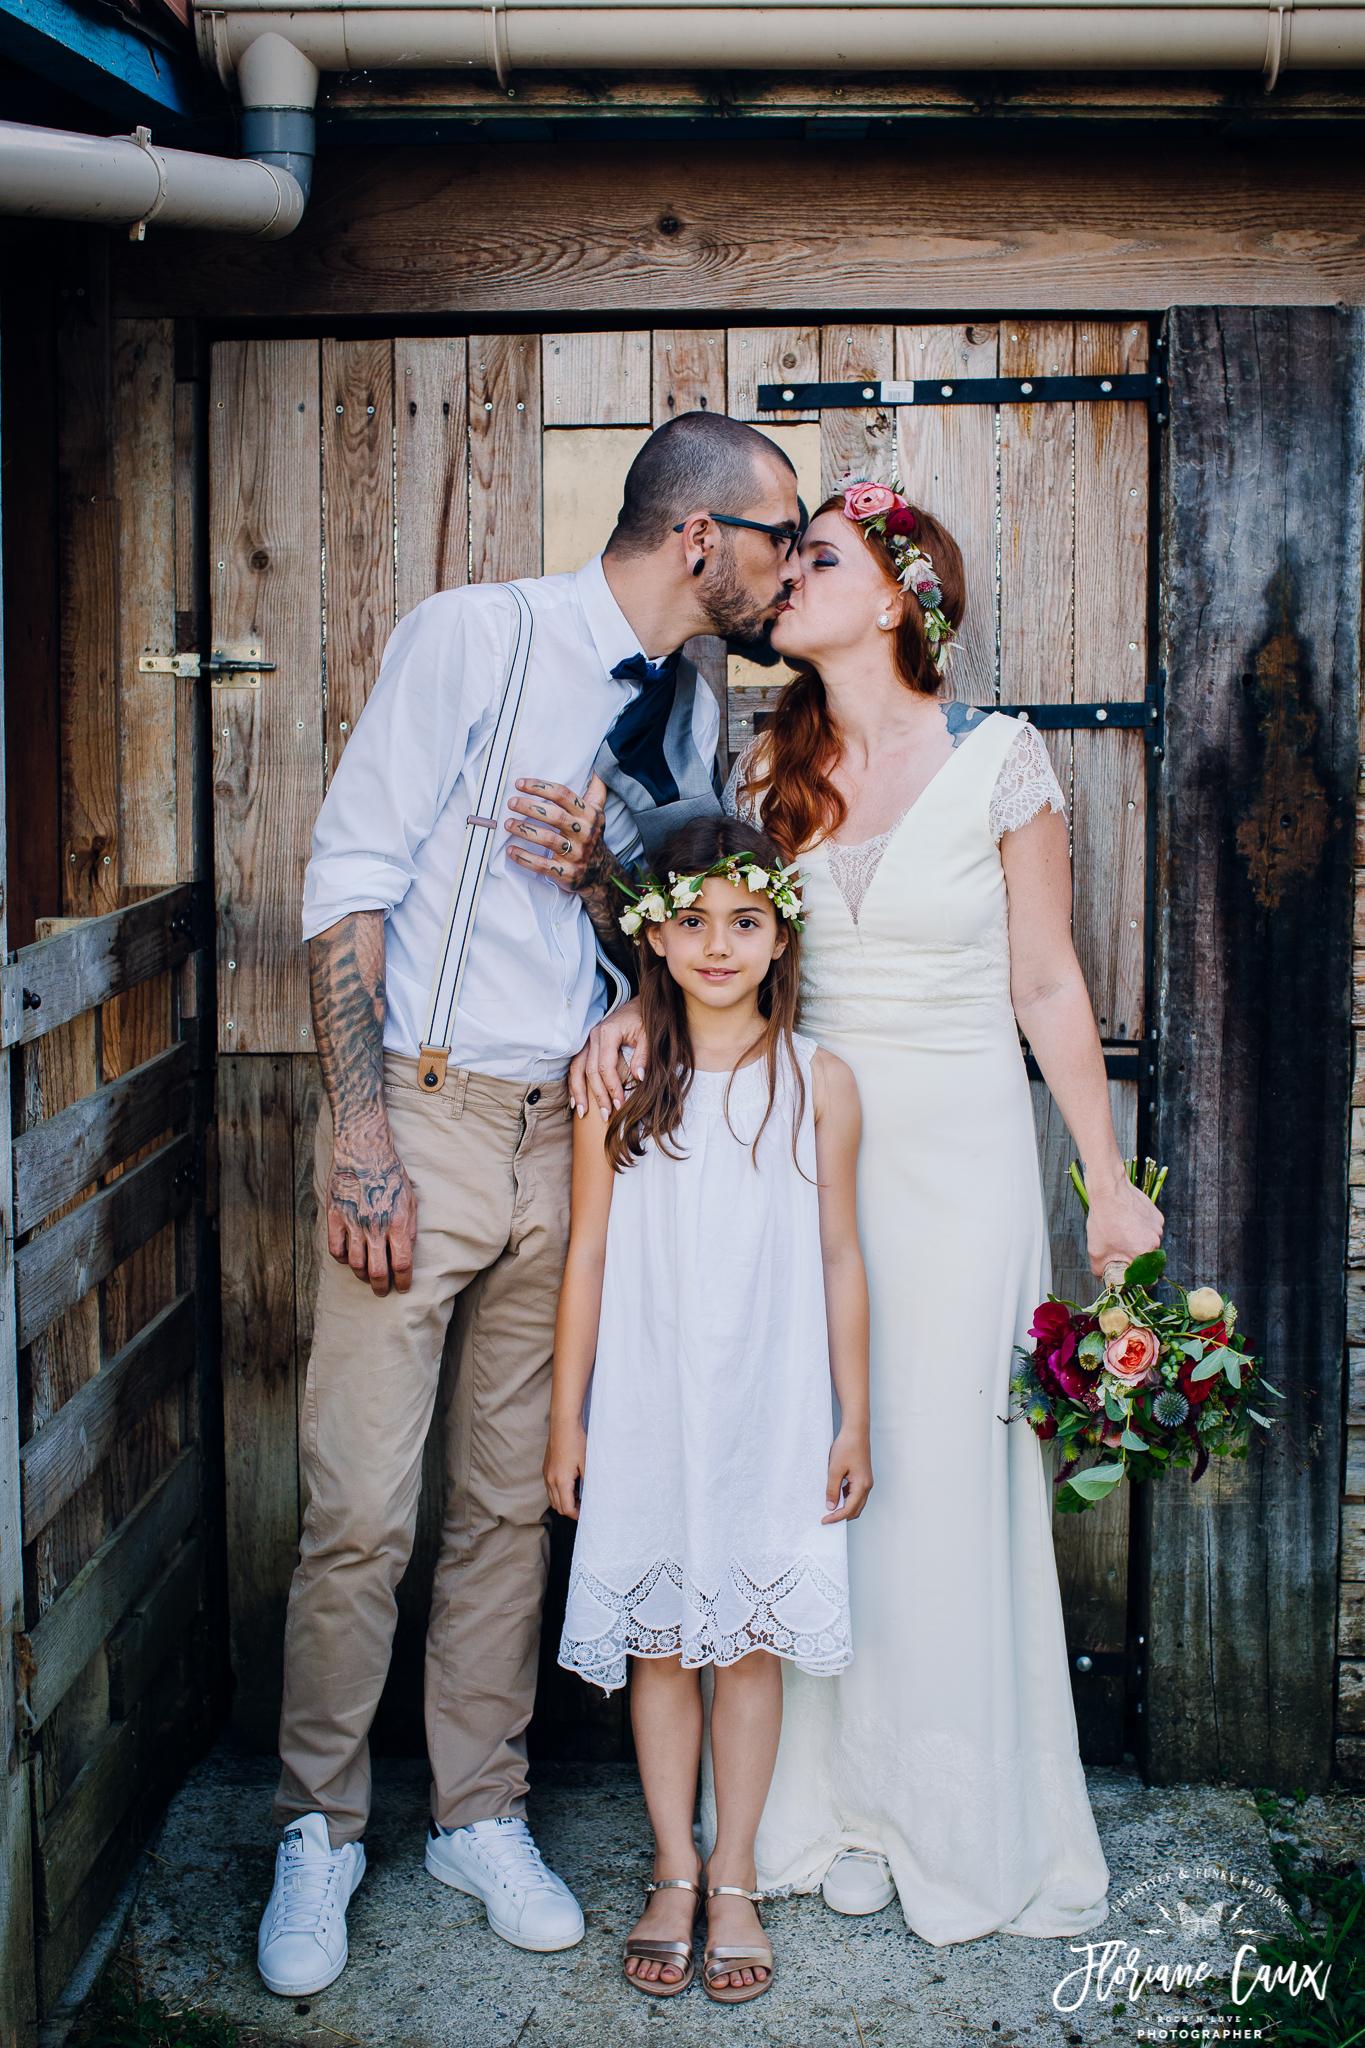 photographe-mariage-toulouse-rocknroll-maries-tatoues-floriane-caux-24